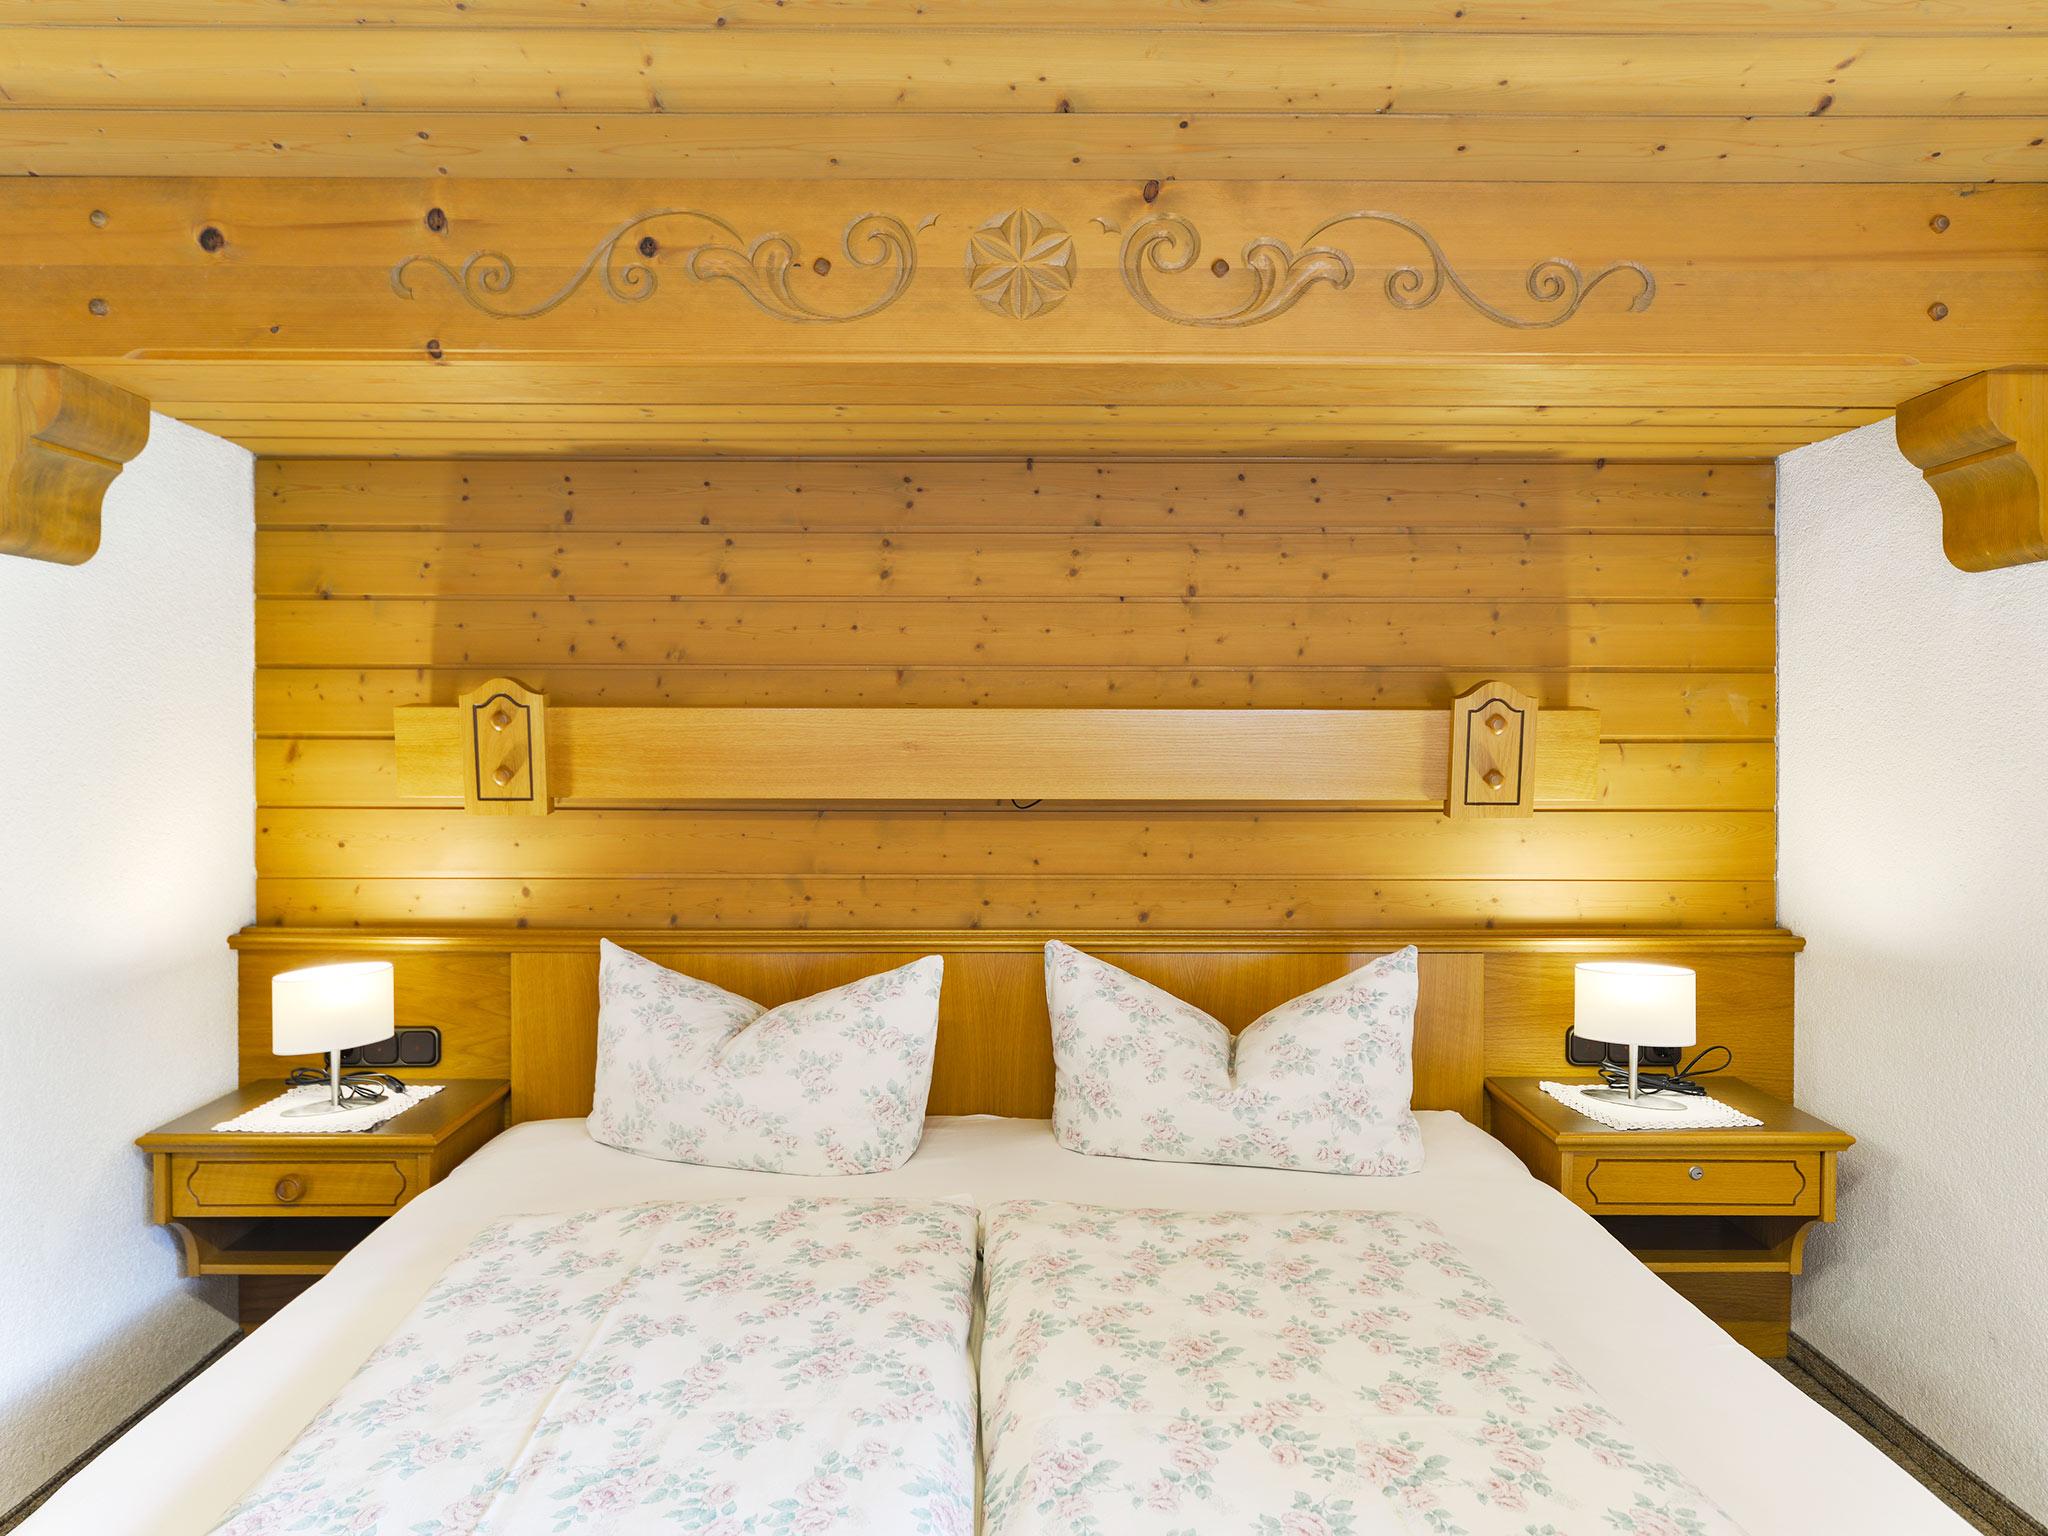 Doppelzimmer pension Oberhauser